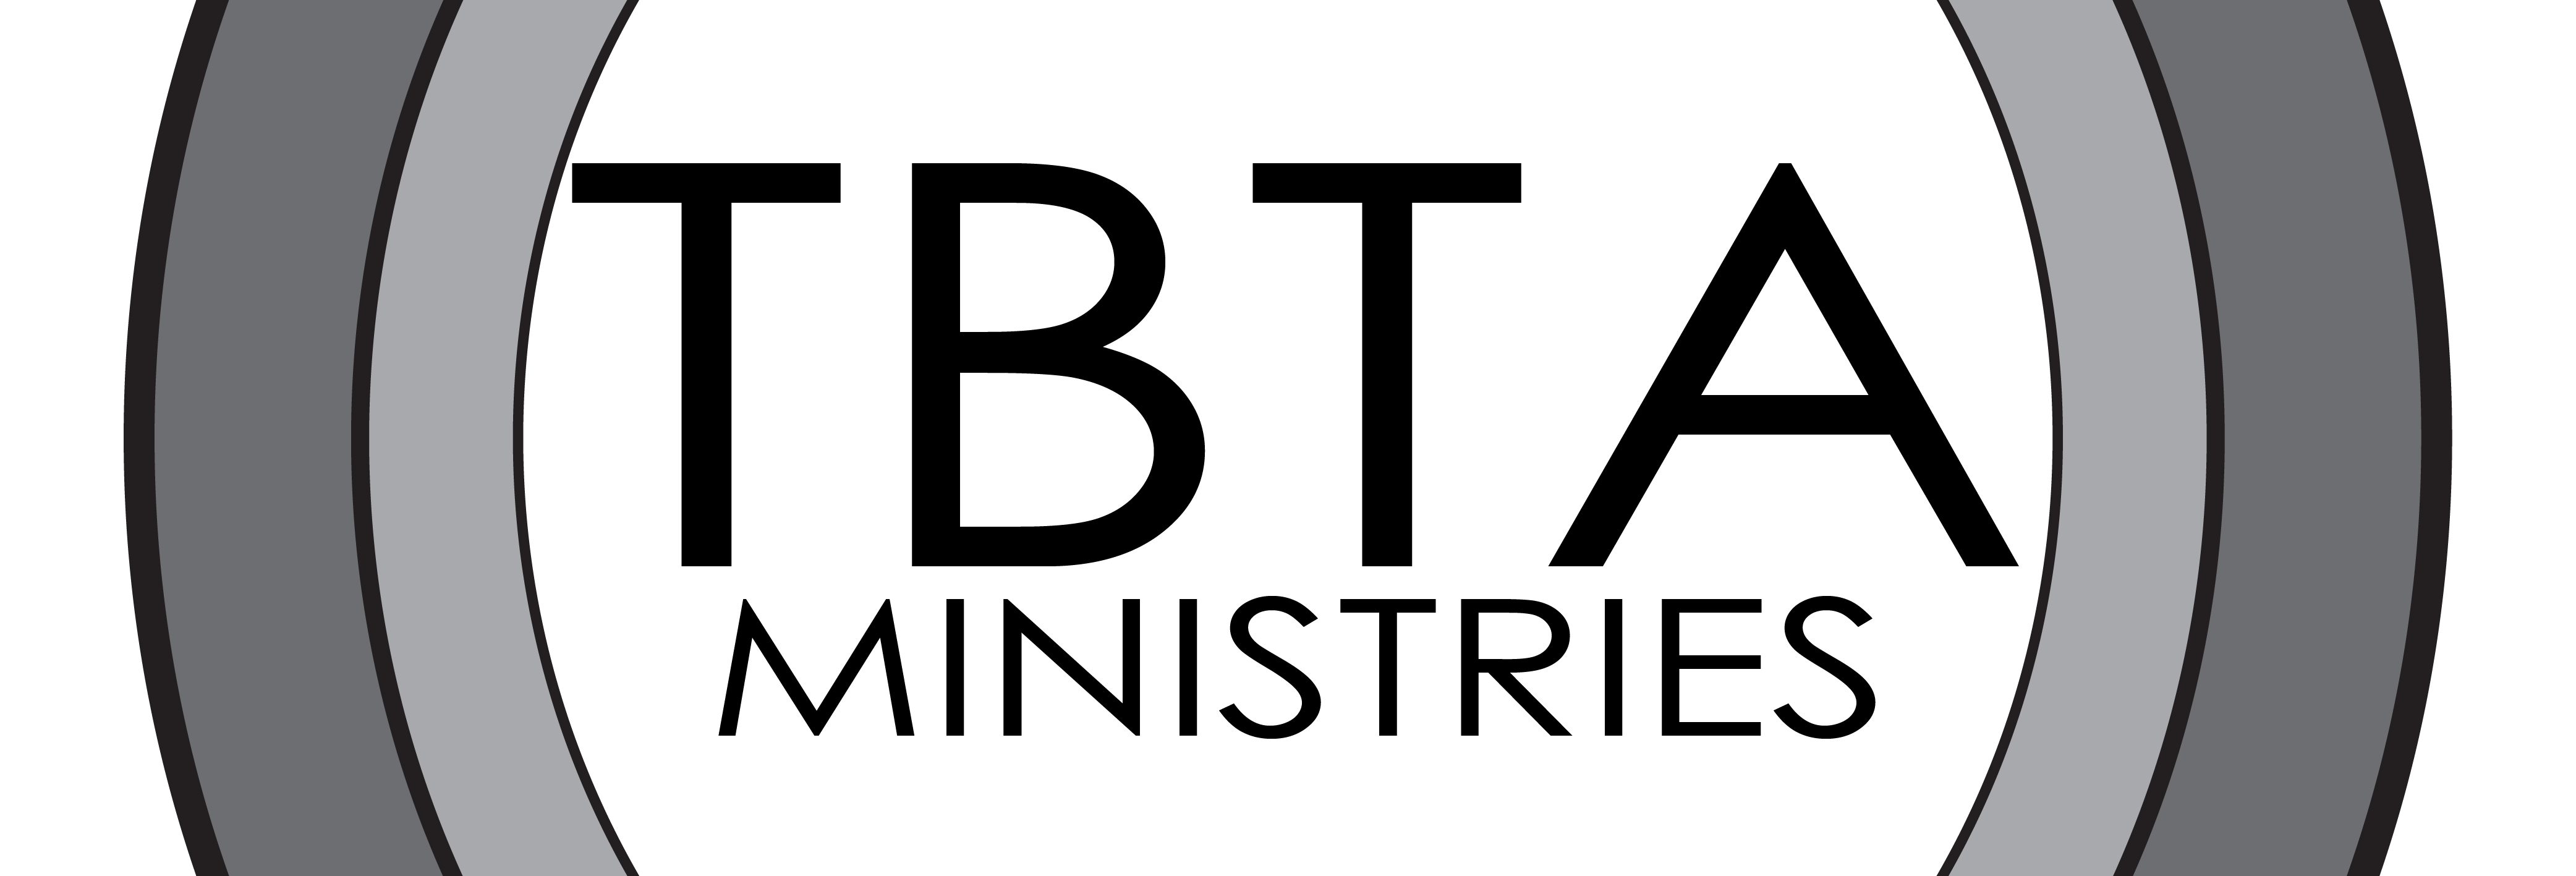 TBTA Ministries